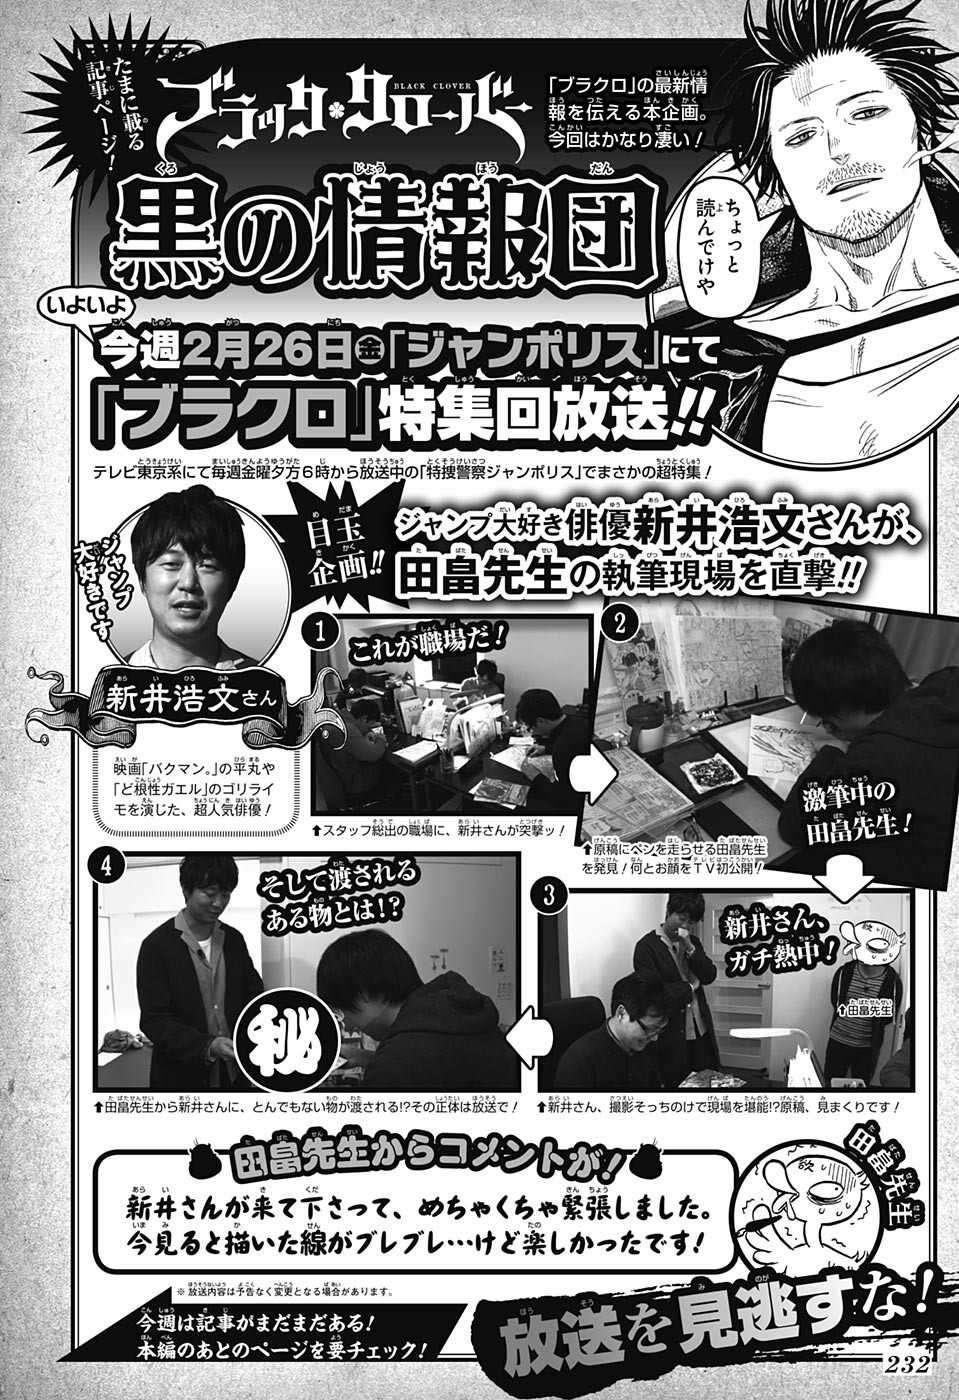 http://c5.ninemanga.com/es_manga/35/3811/446294/cca437dfff11995edc035566eabec9a7.jpg Page 3